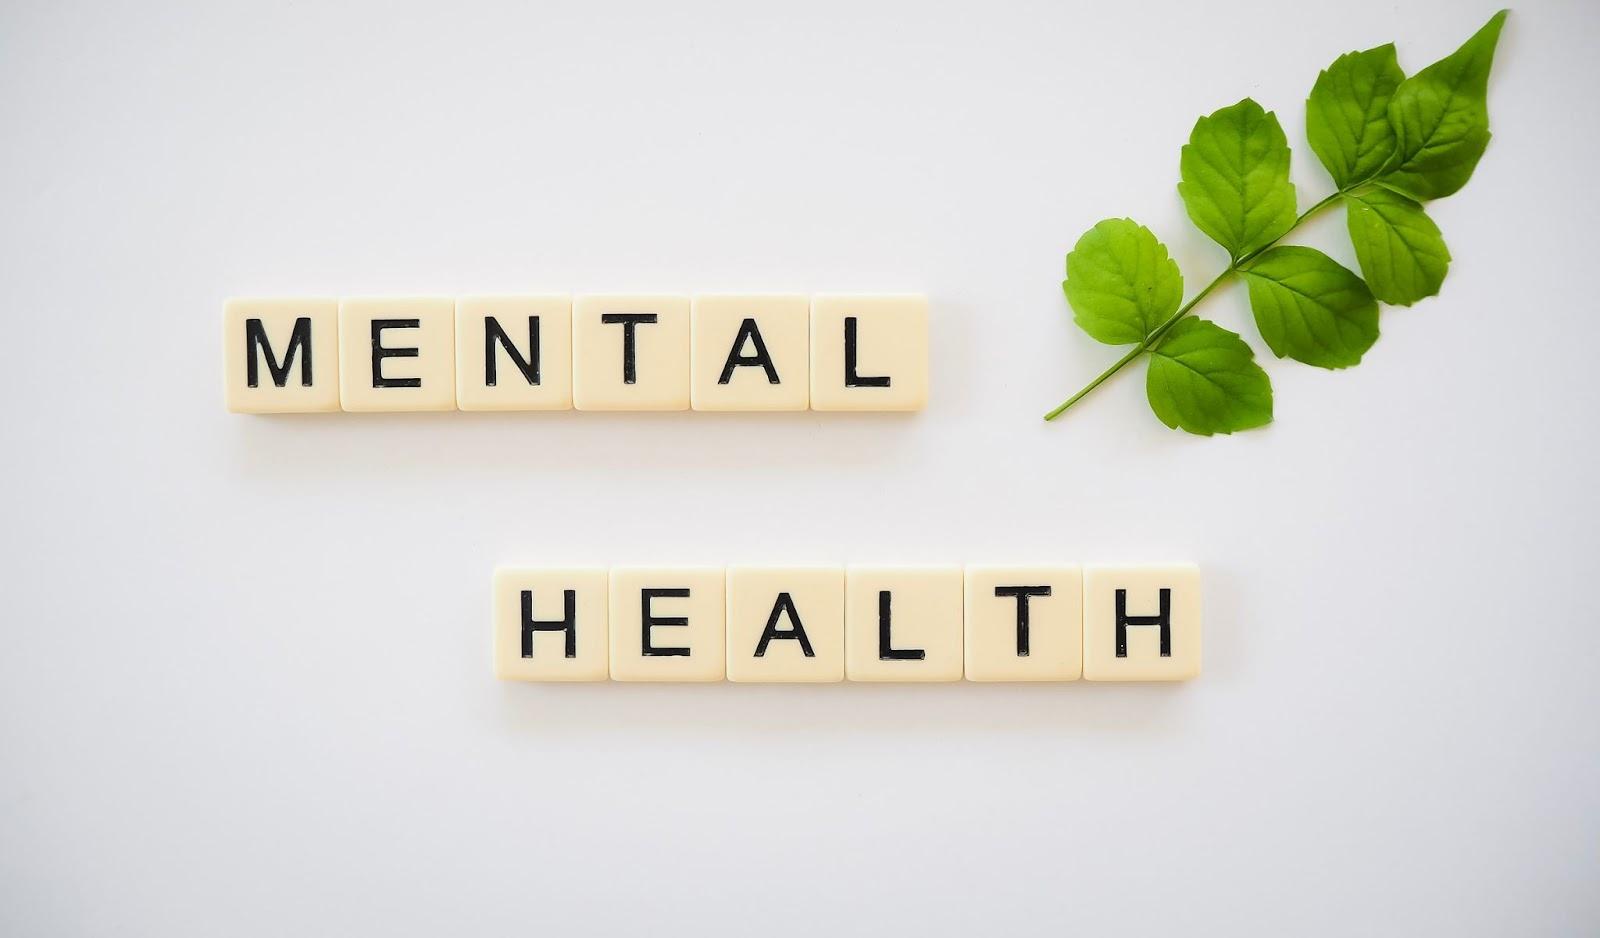 mental health written with Scrabble letters